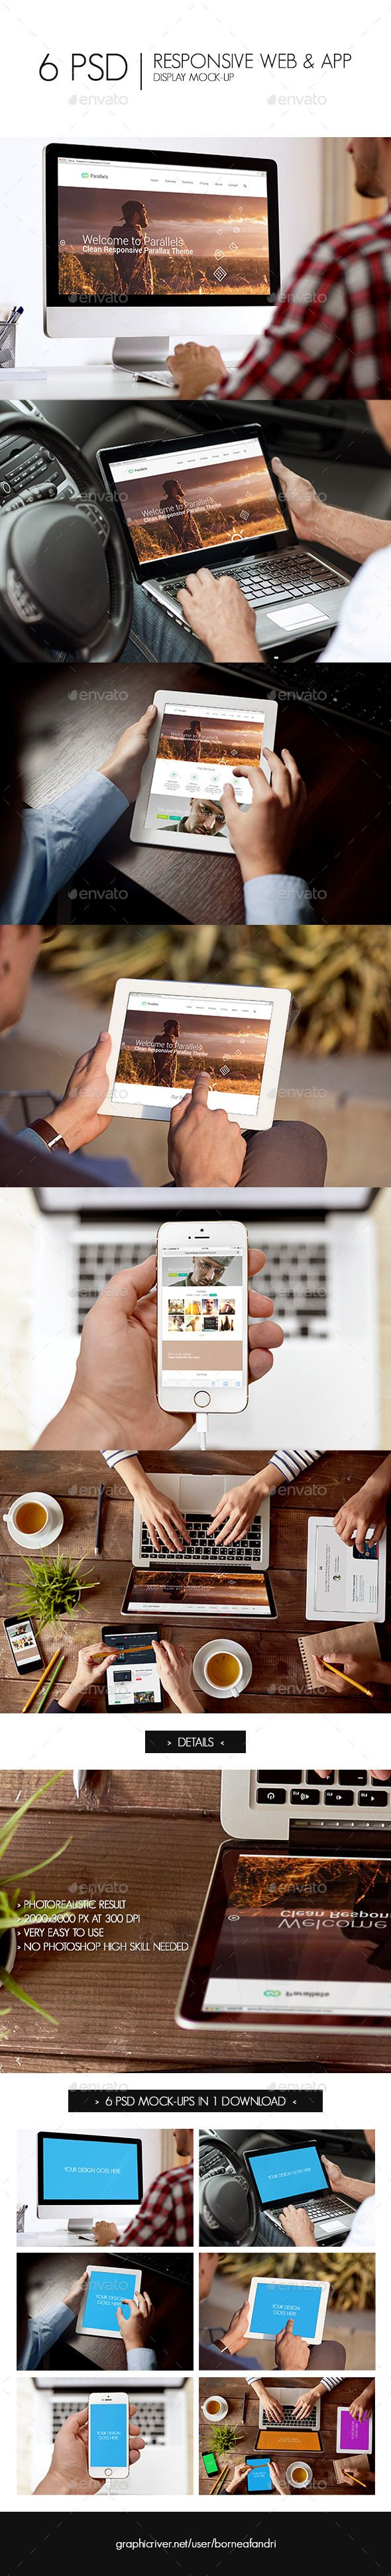 Responsive Web & App Display Mock-Up. Download: http://graphicriver.net/item/responsive-web-app-display-mockup/11190848?ref=ksioks